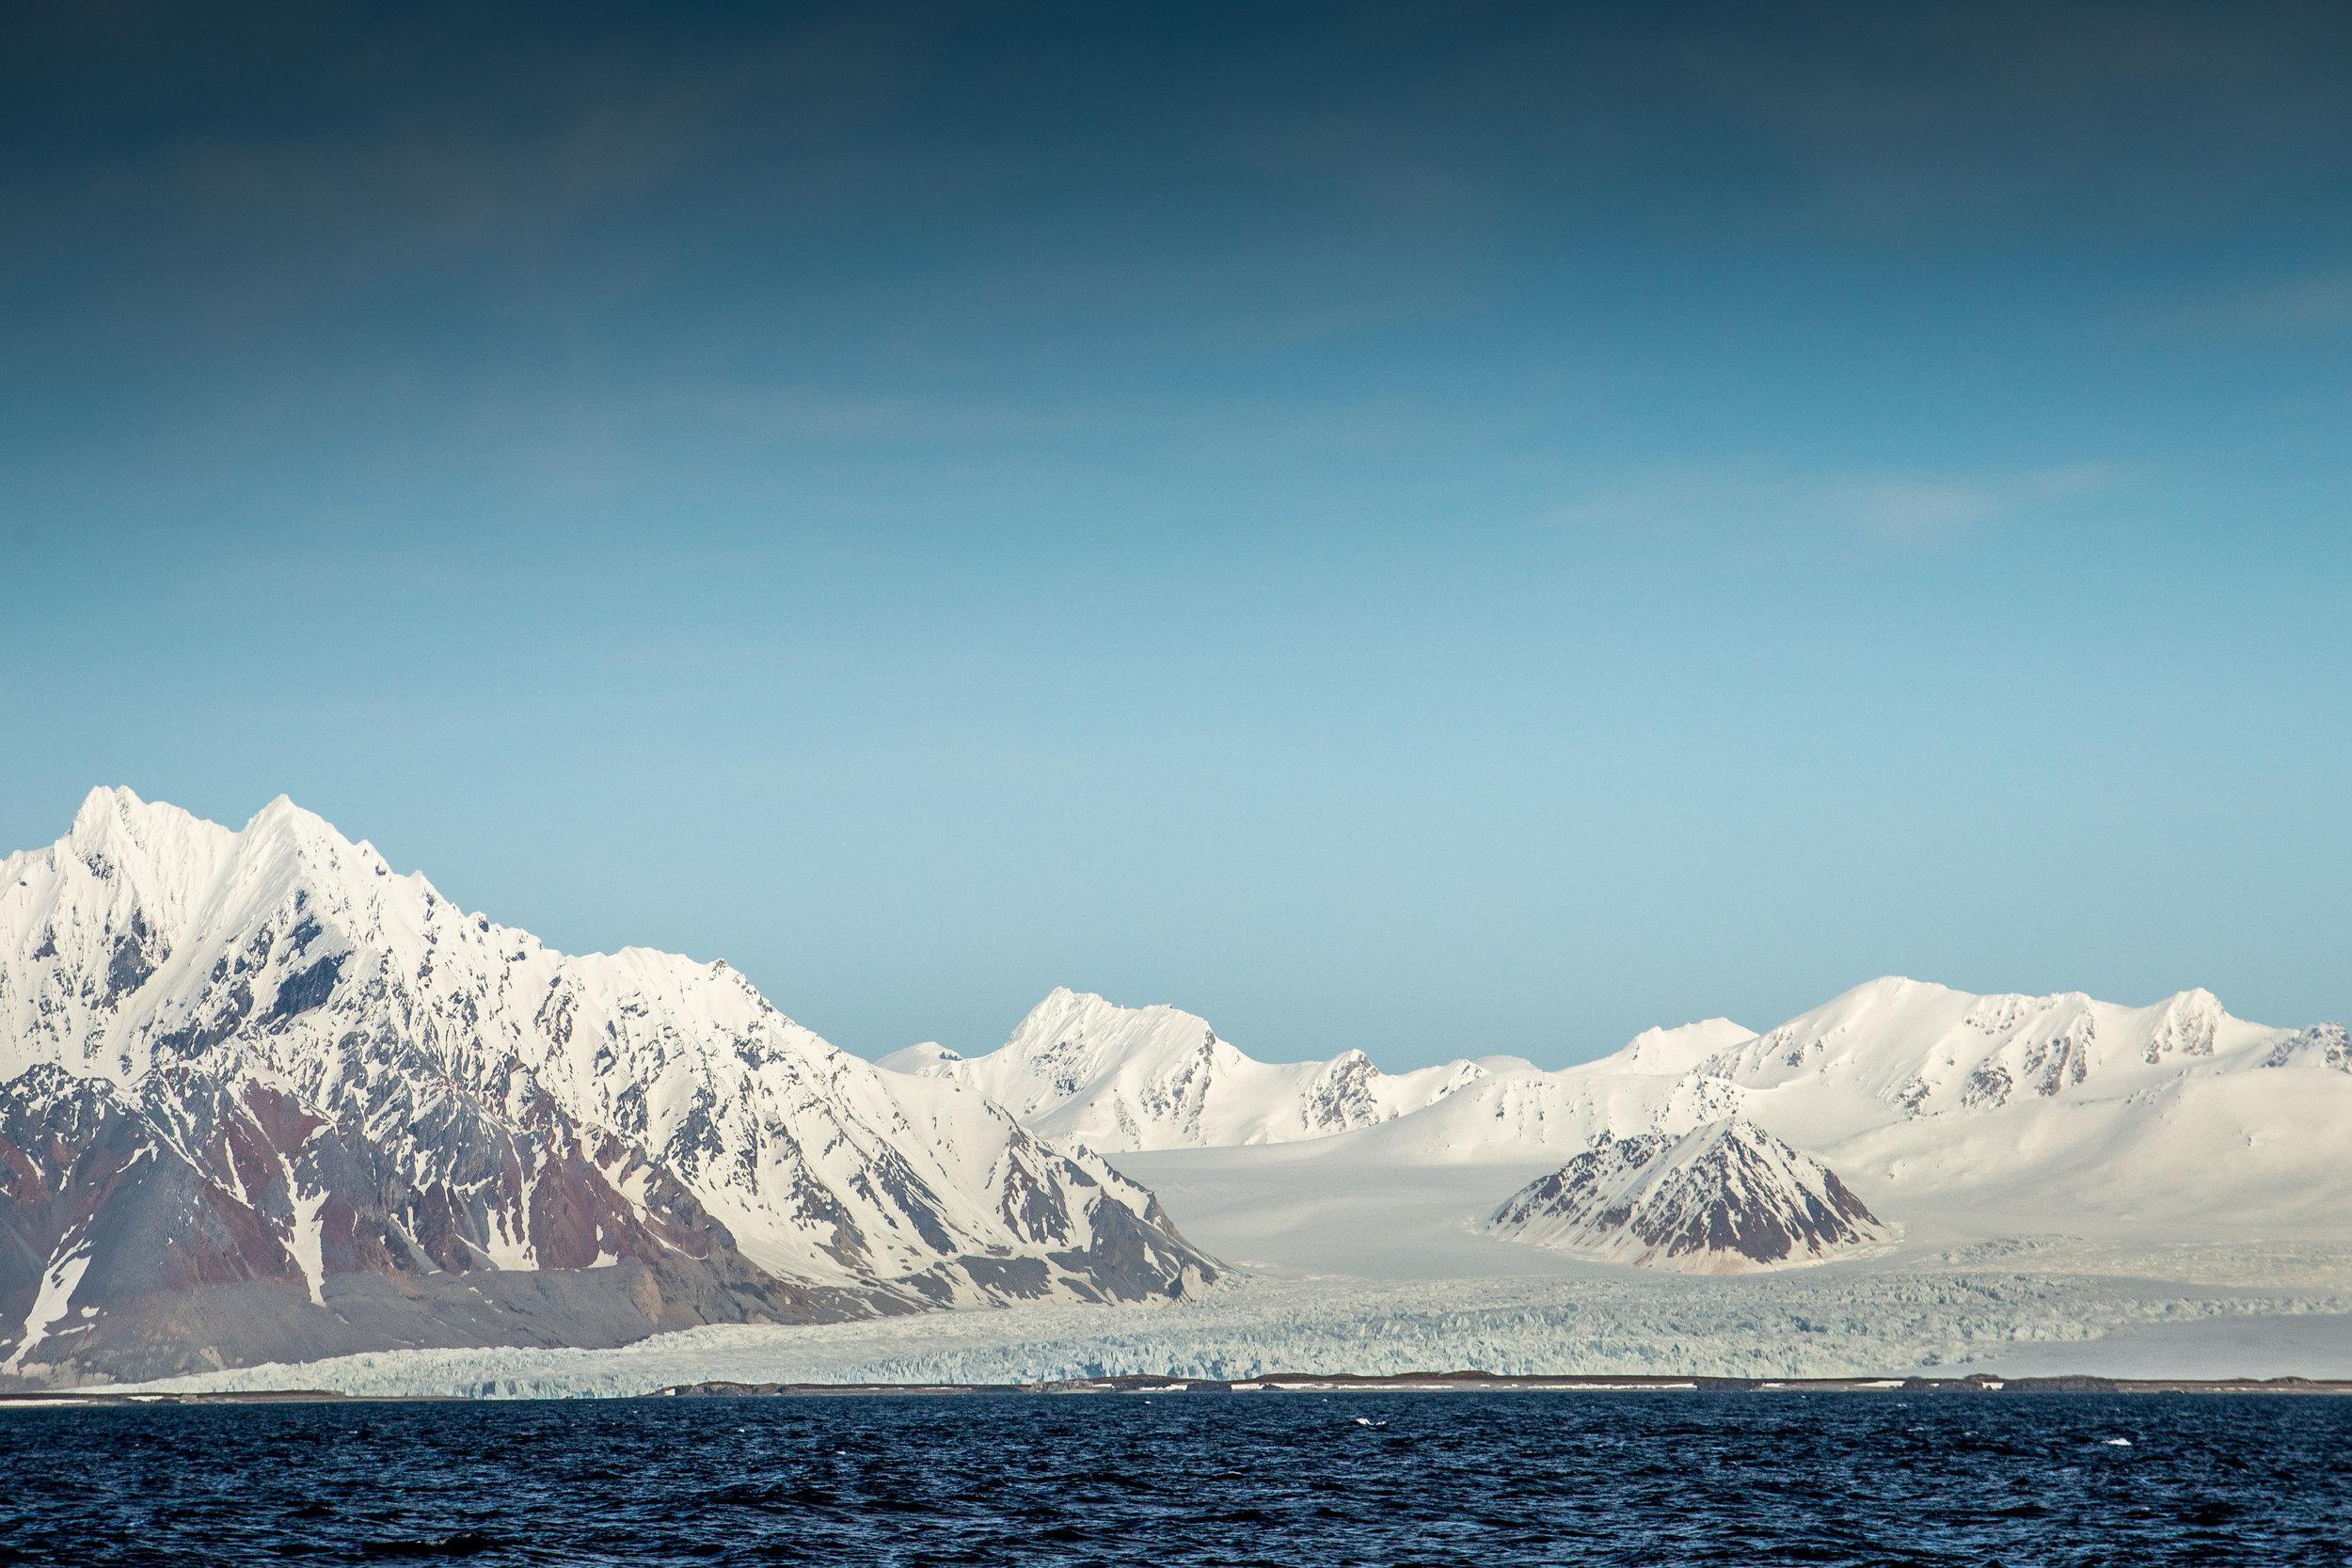 Sailing past glaciers on the west coast of Spitzbergen